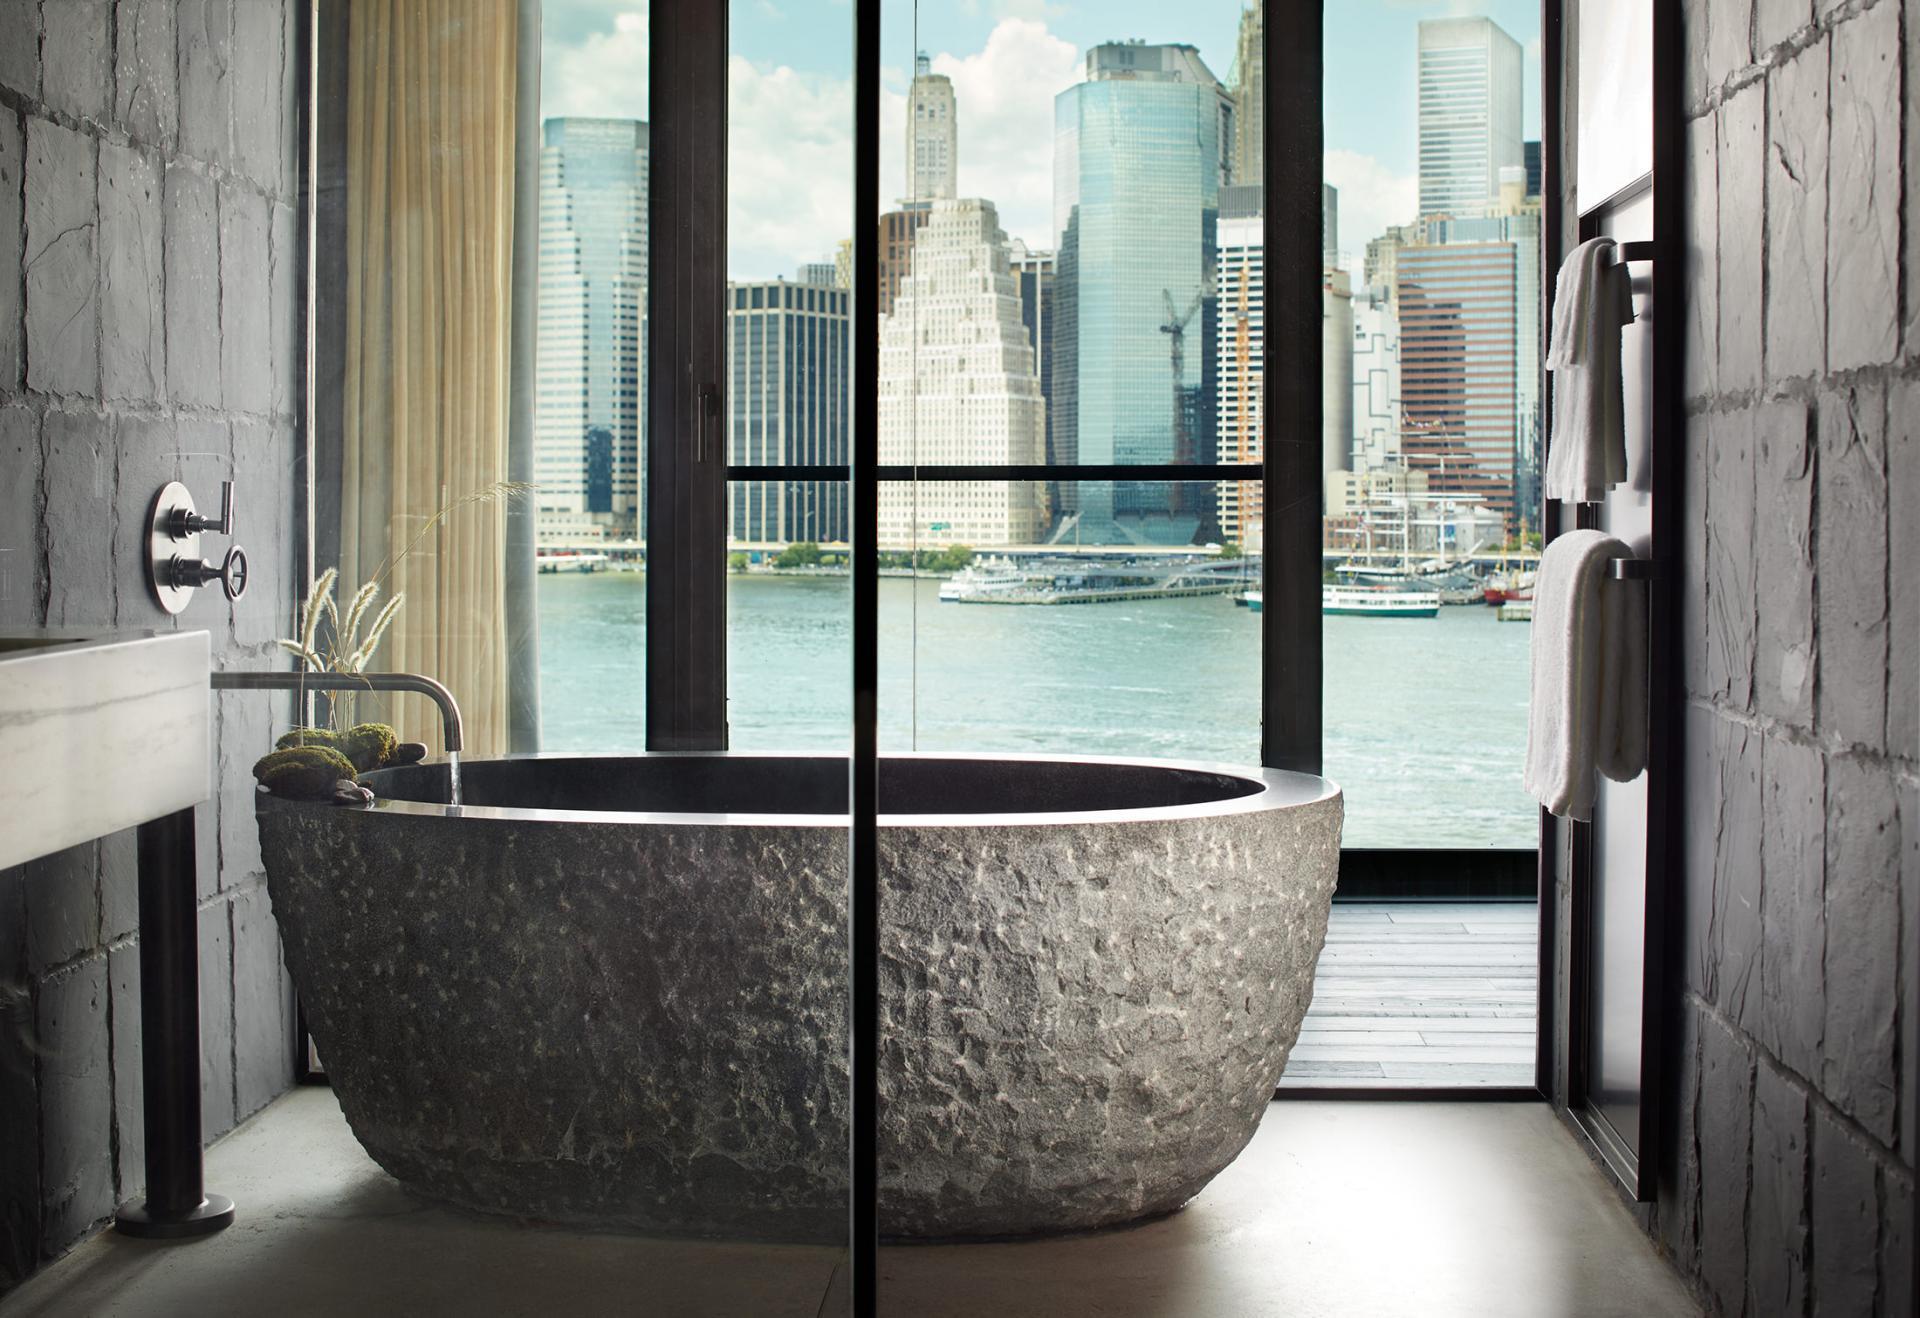 Riverhouse 2 000 Sq Ft 2 Rooms 1 Hotel Brooklyn Bridge